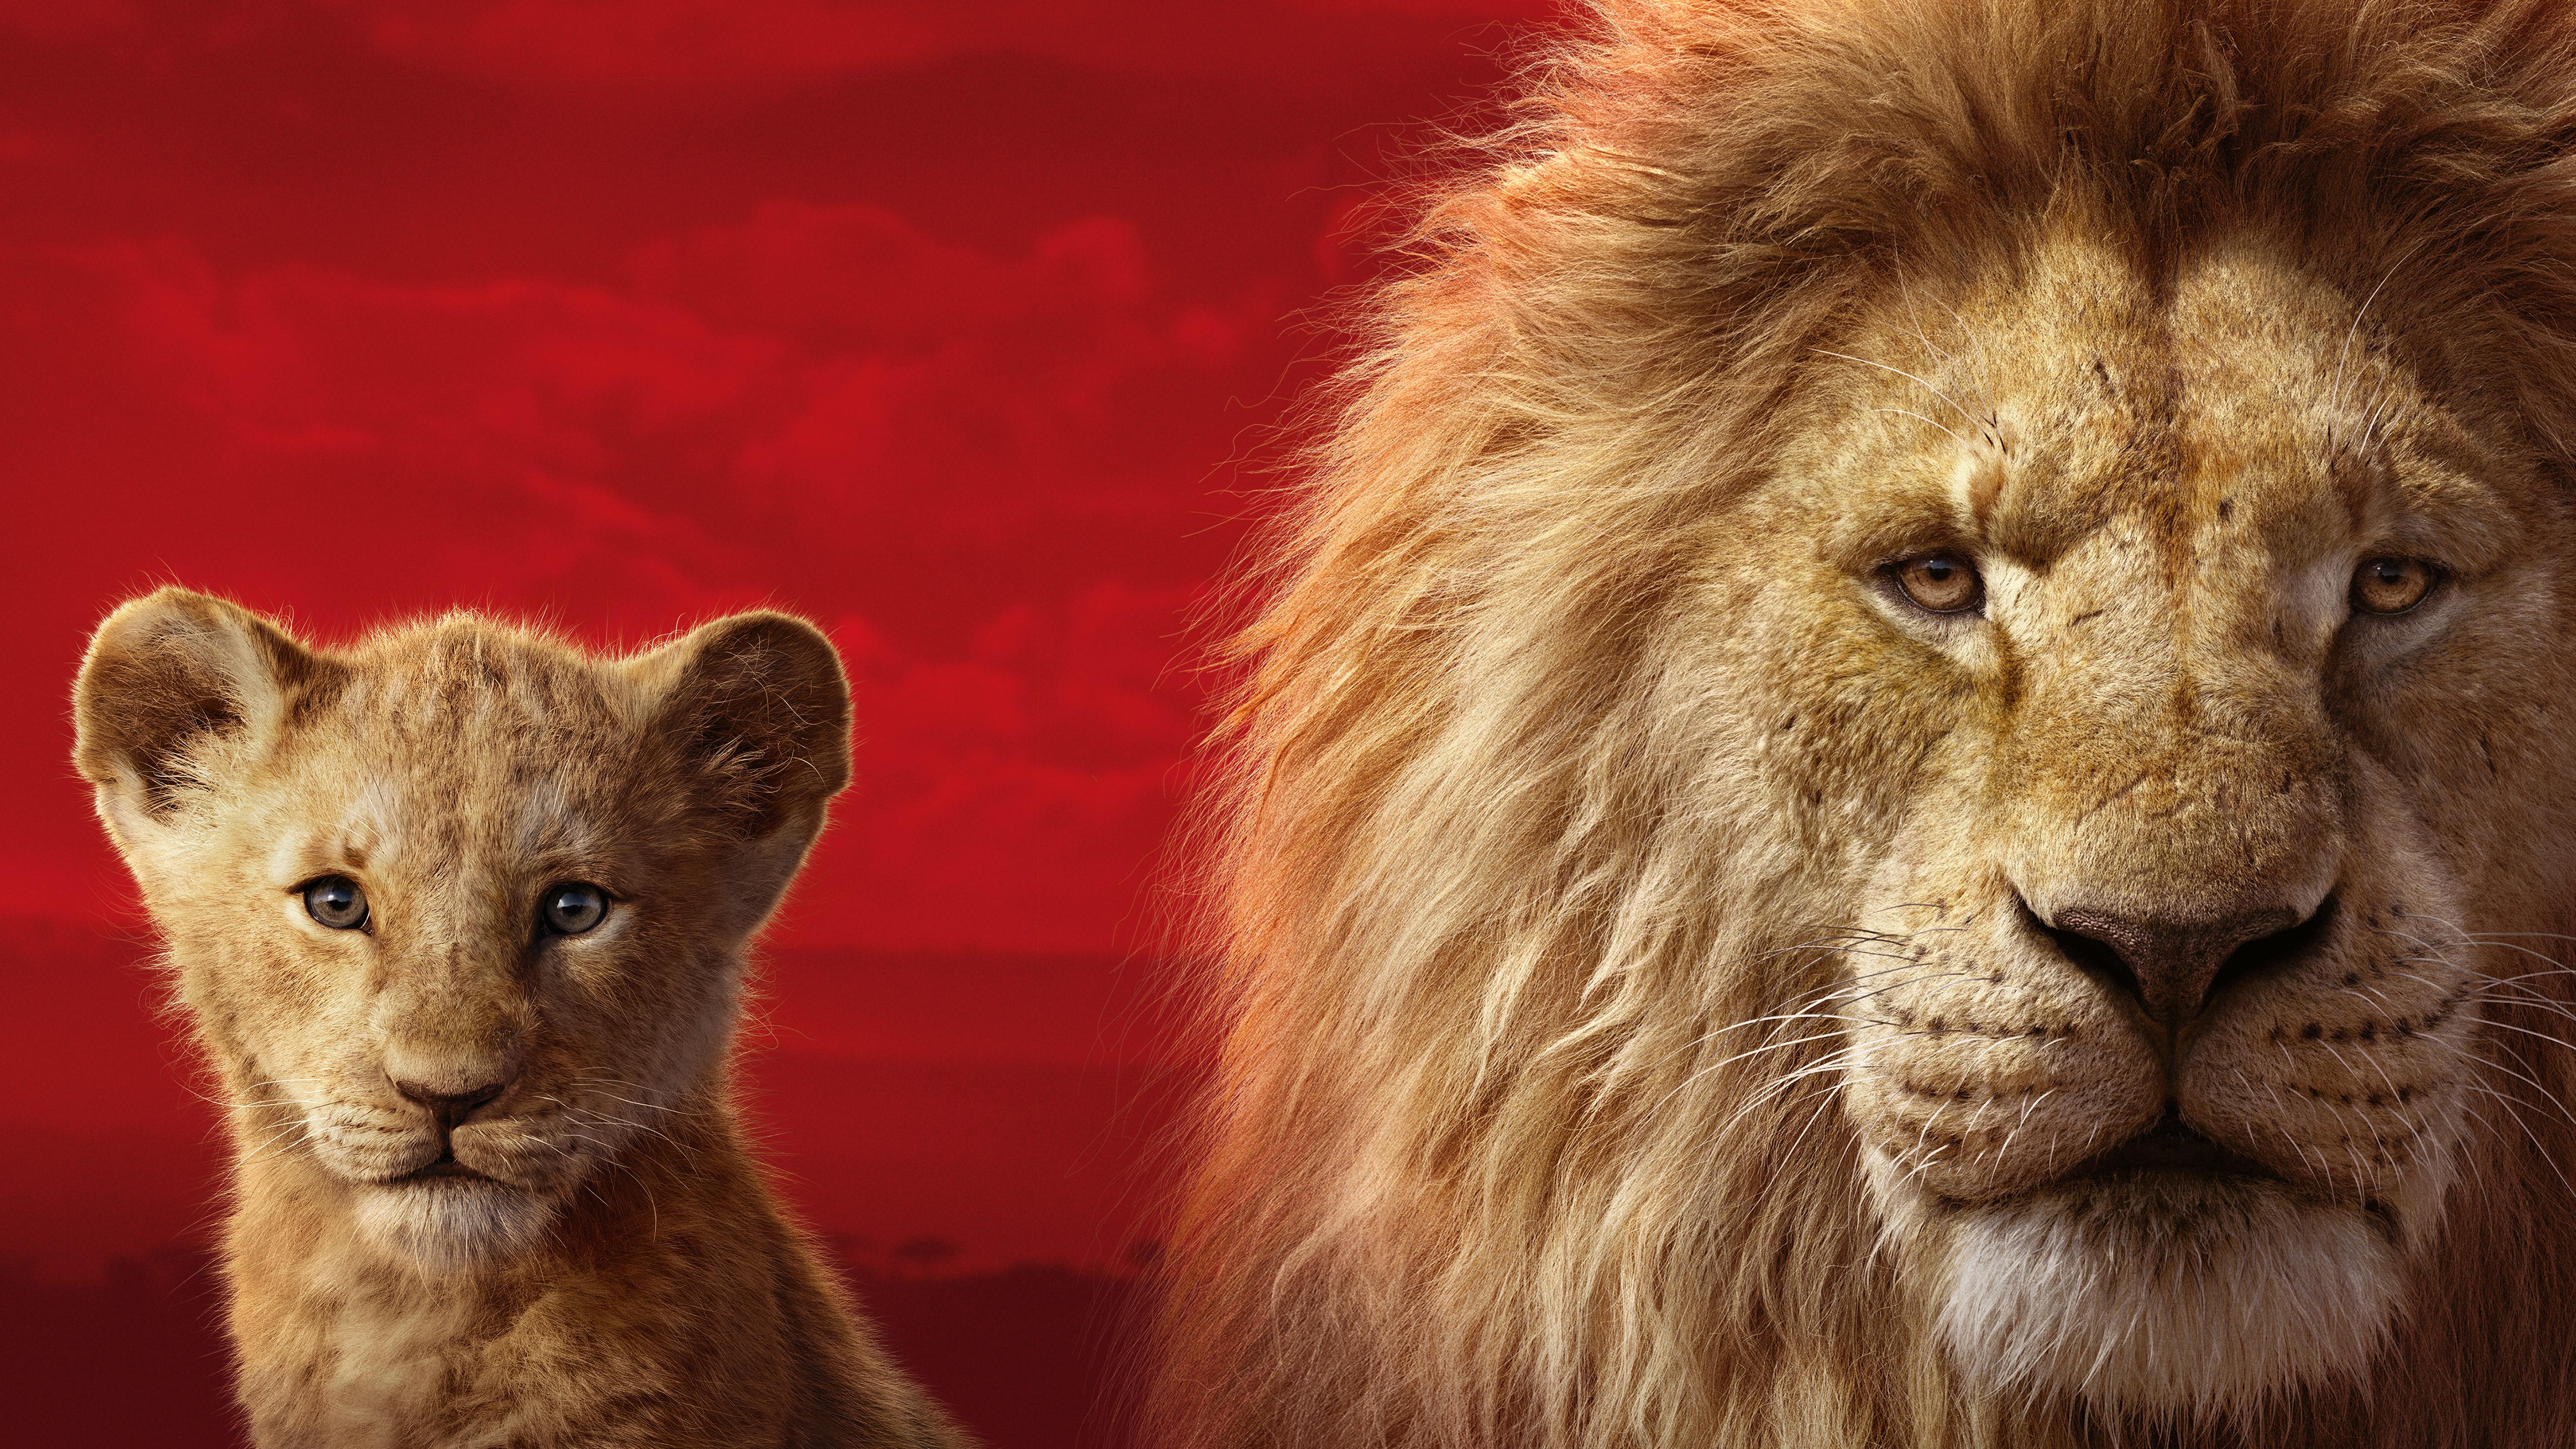 The Lion King 2019 5k Retina Ultra HD Wallpaper Background 5120x2880